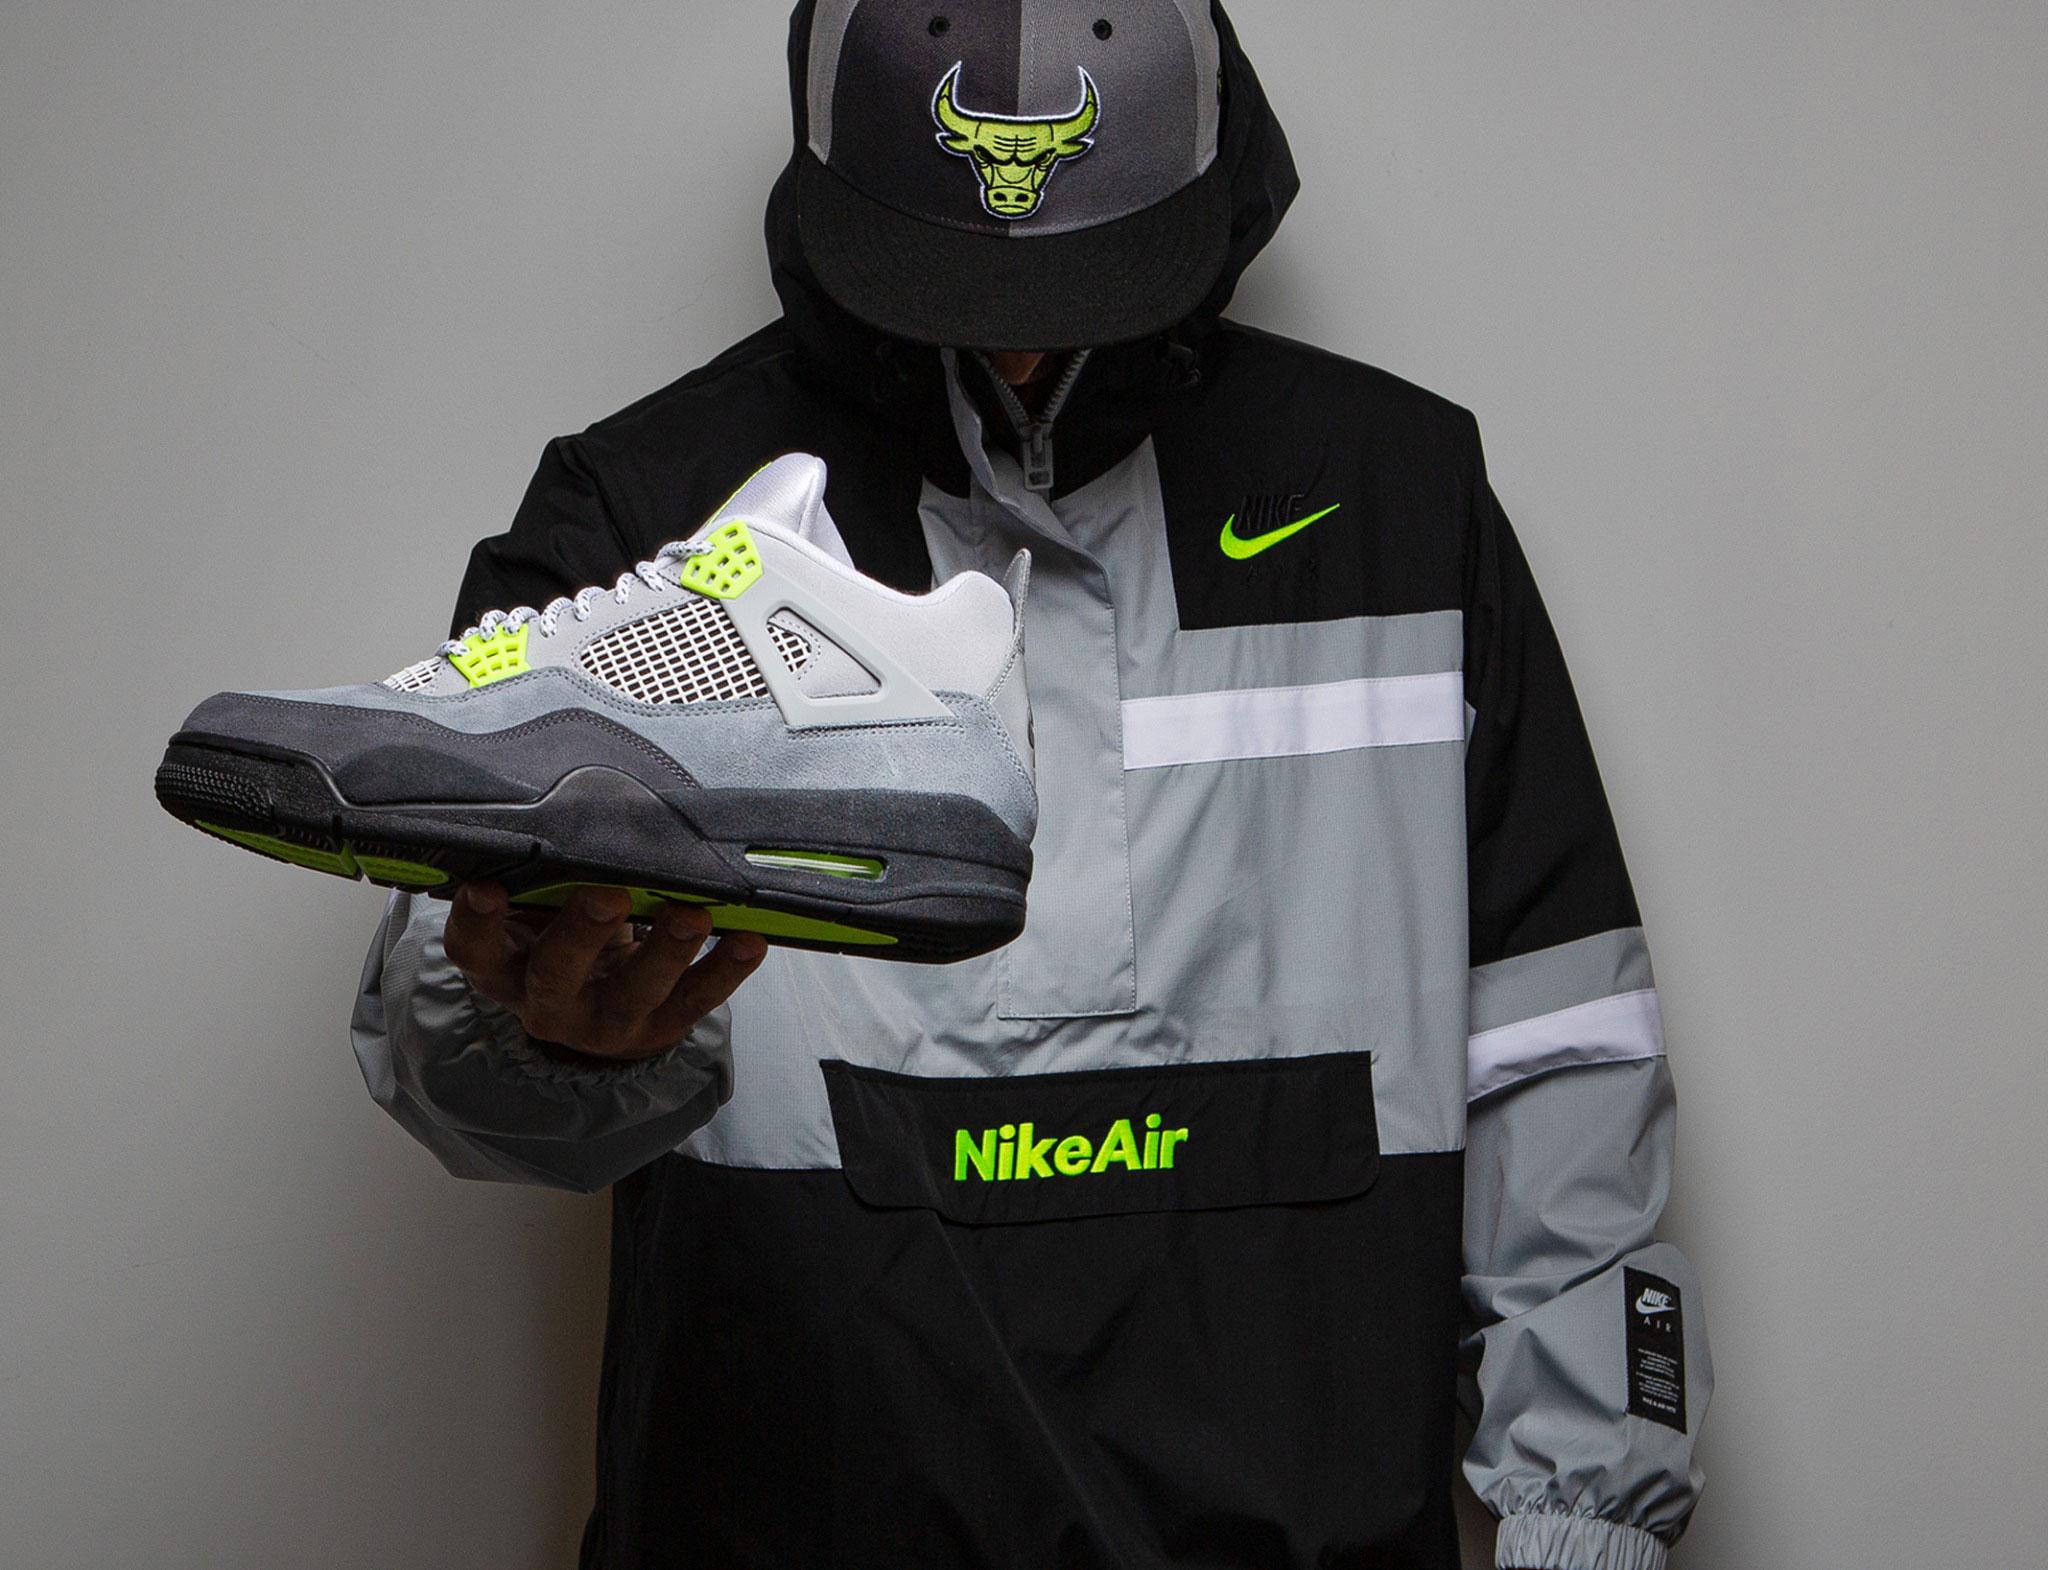 air-jordan-4-neon-hat-jacket-outfit-match